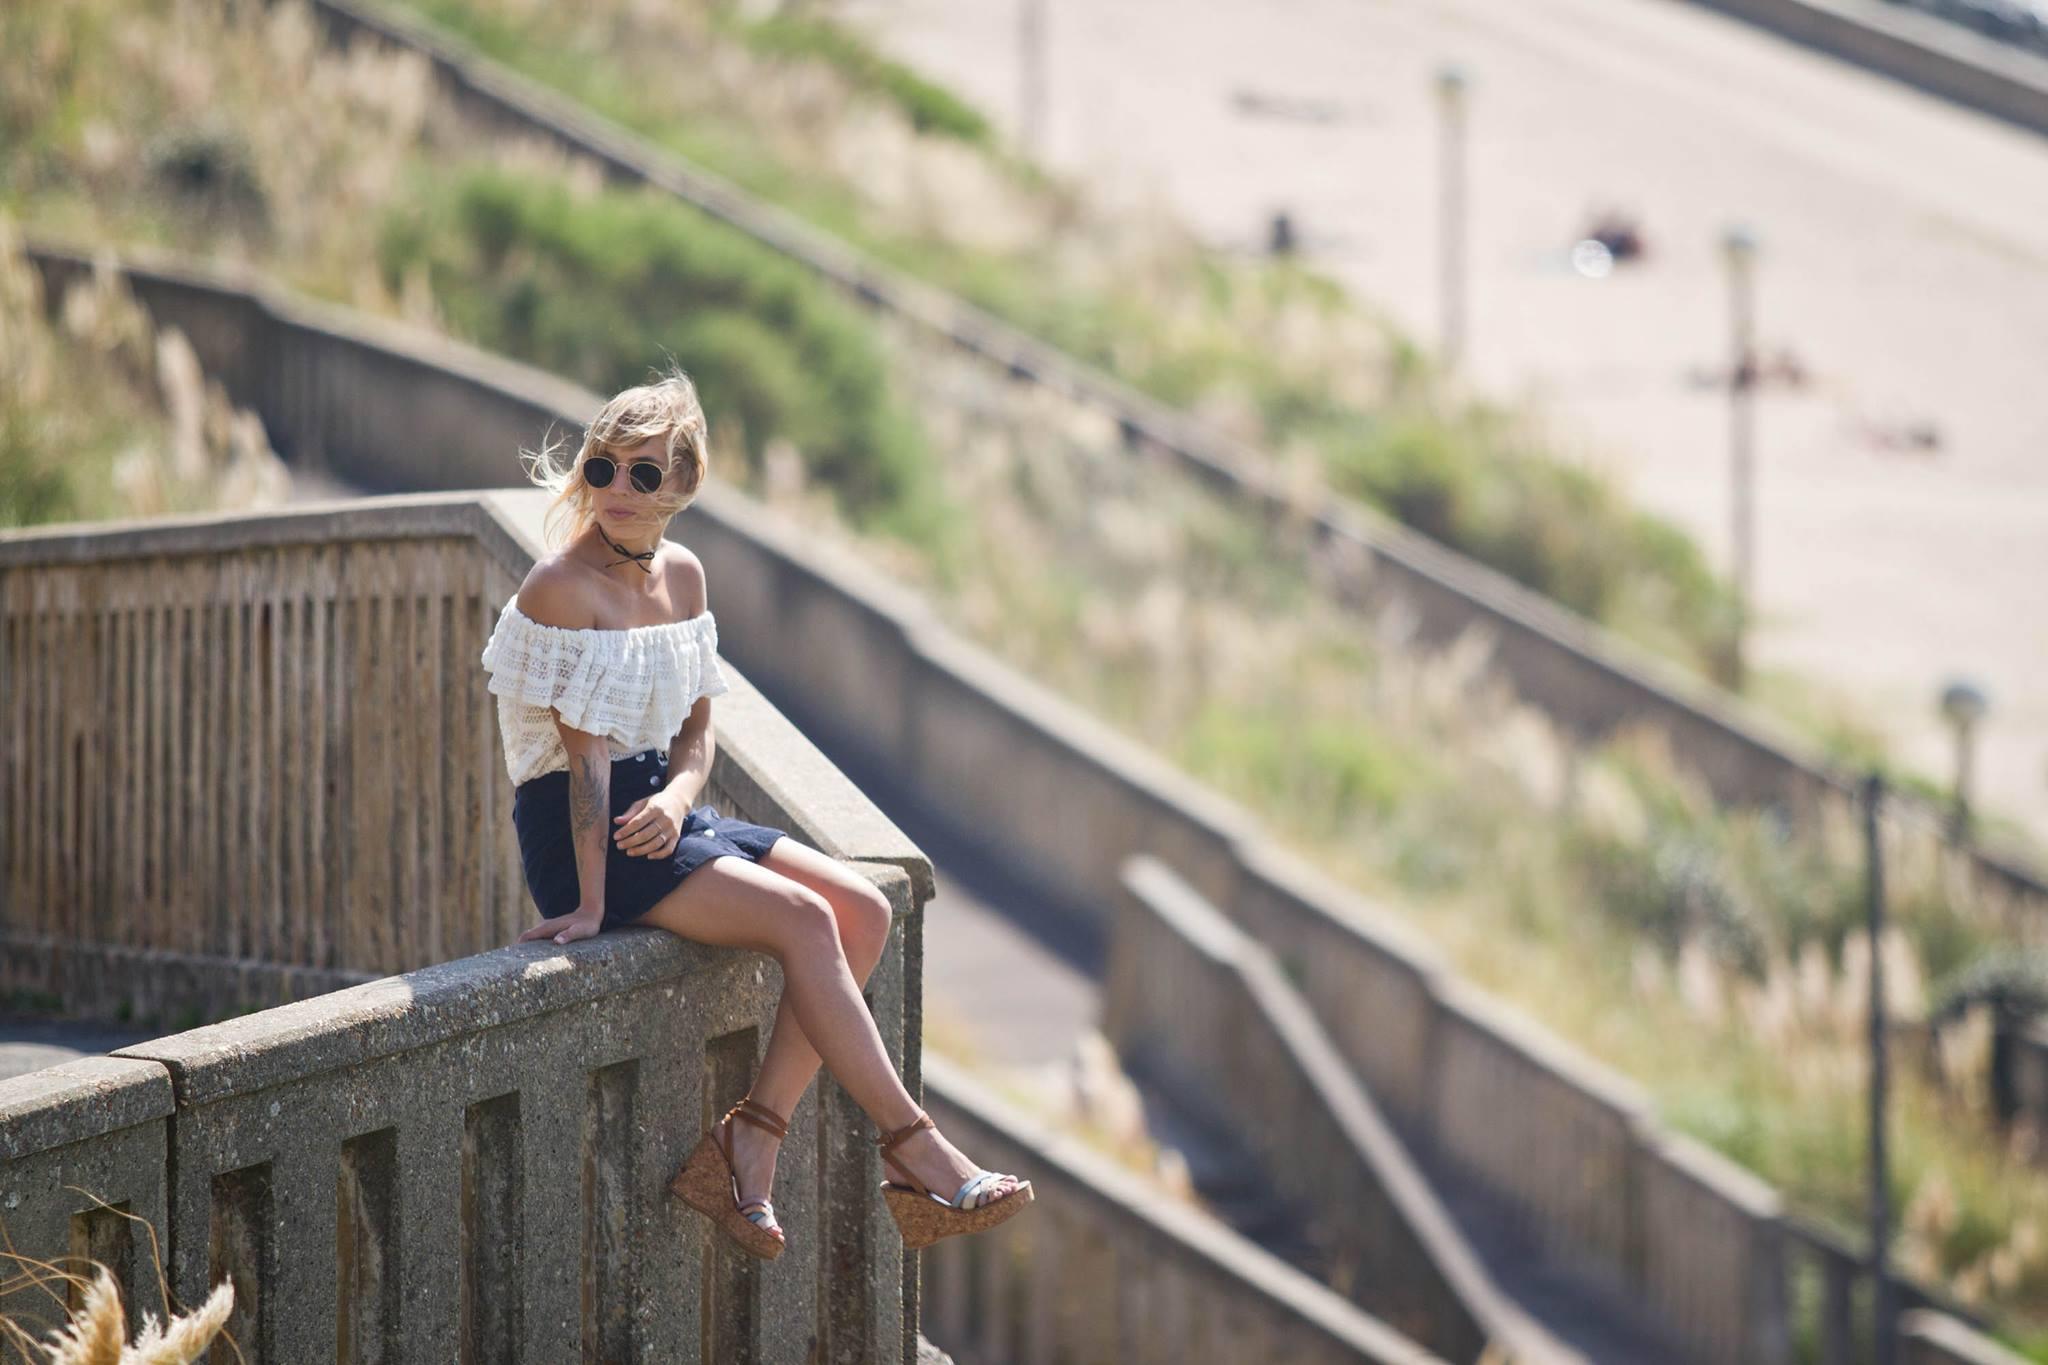 Top épaules dénudées jupe en velours et sandales Kjacques I Sp4nkblog 2